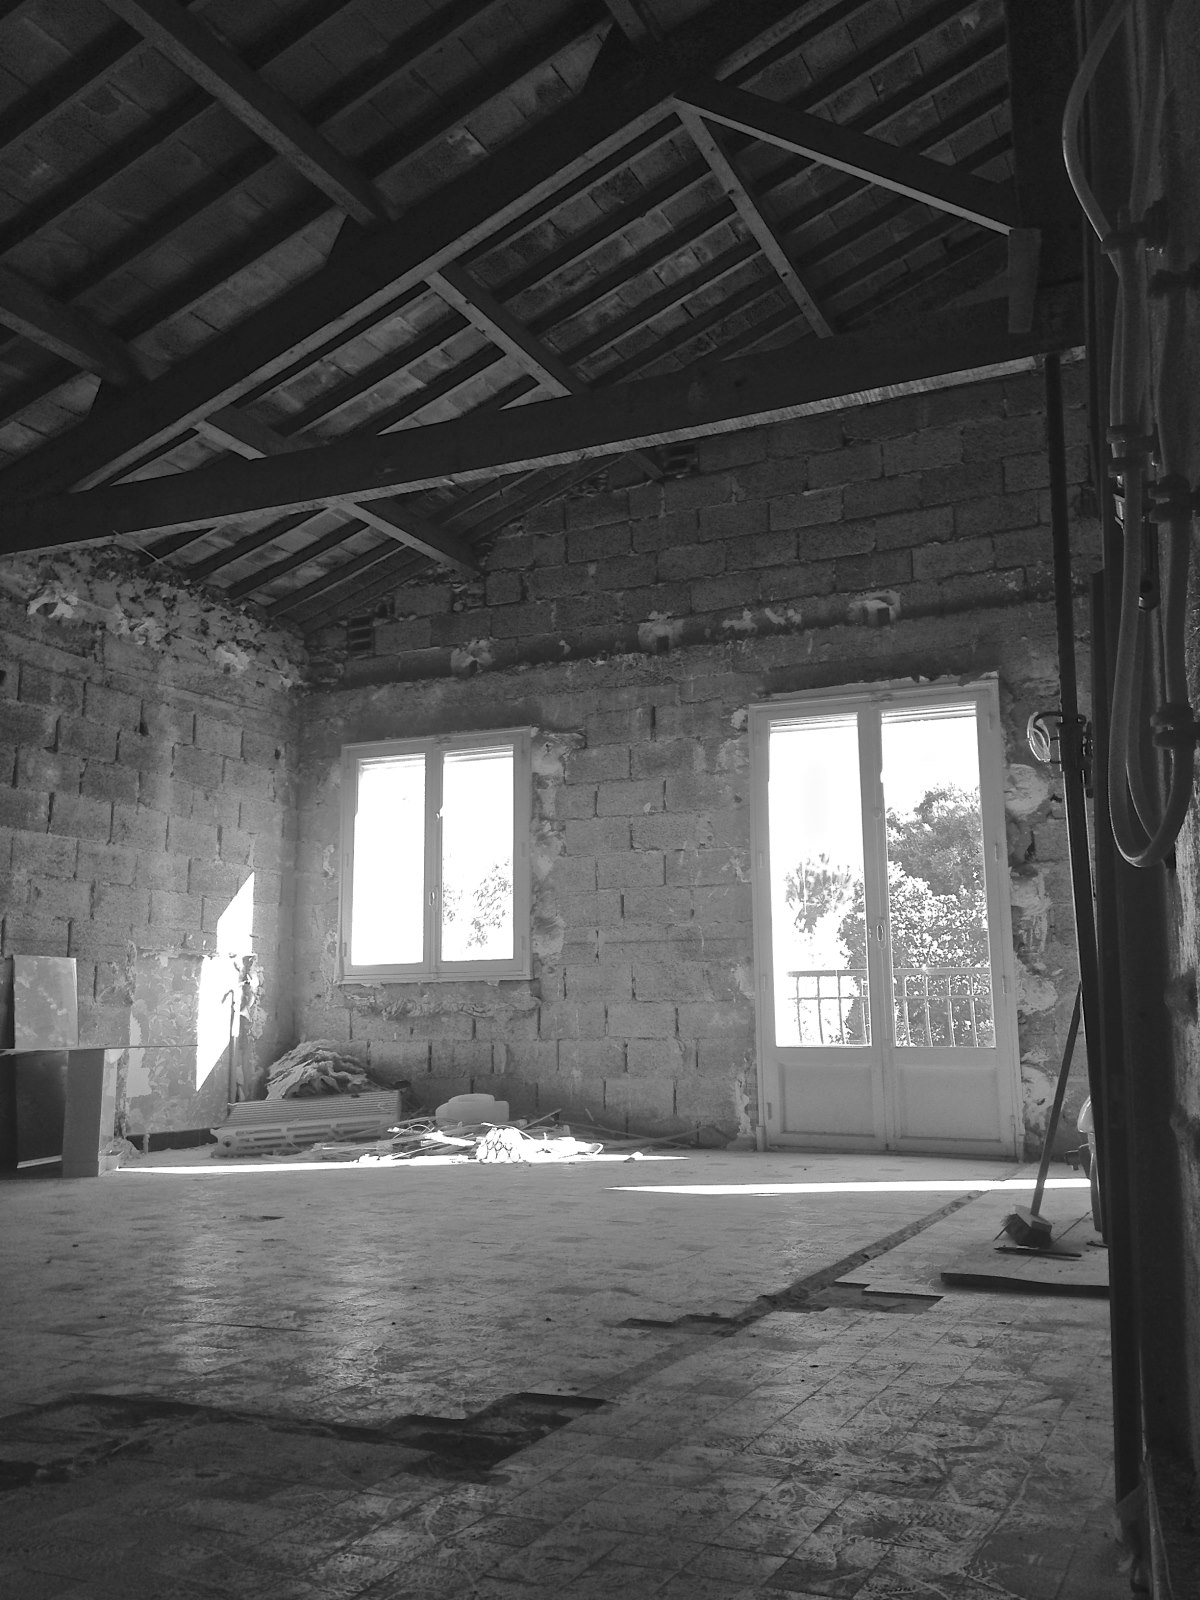 chantier-transformation-maison-charpente-individuelle-marseille-azzaro-architecte